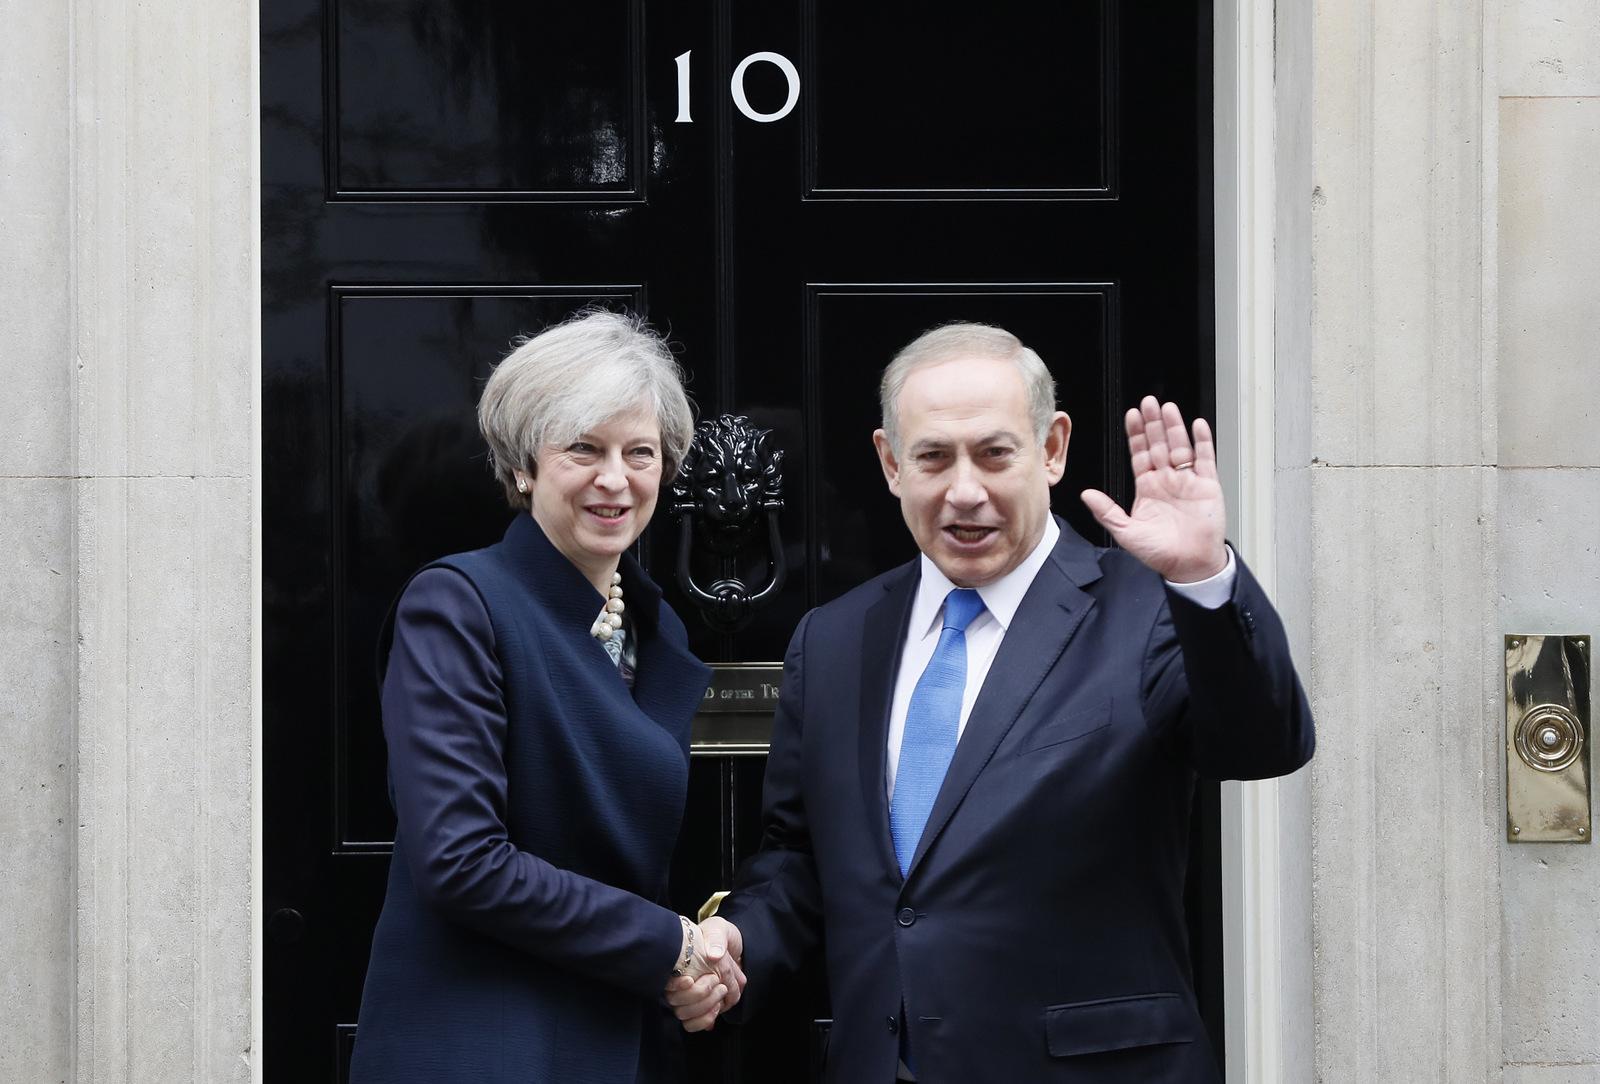 Britain's Prime Minister Theresa May greets Prime Minister Benjamin Netanyahu of Israel at Downing Street in London, Monday, Feb. 6, 2017. (AP/Kirsty Wigglesworth)